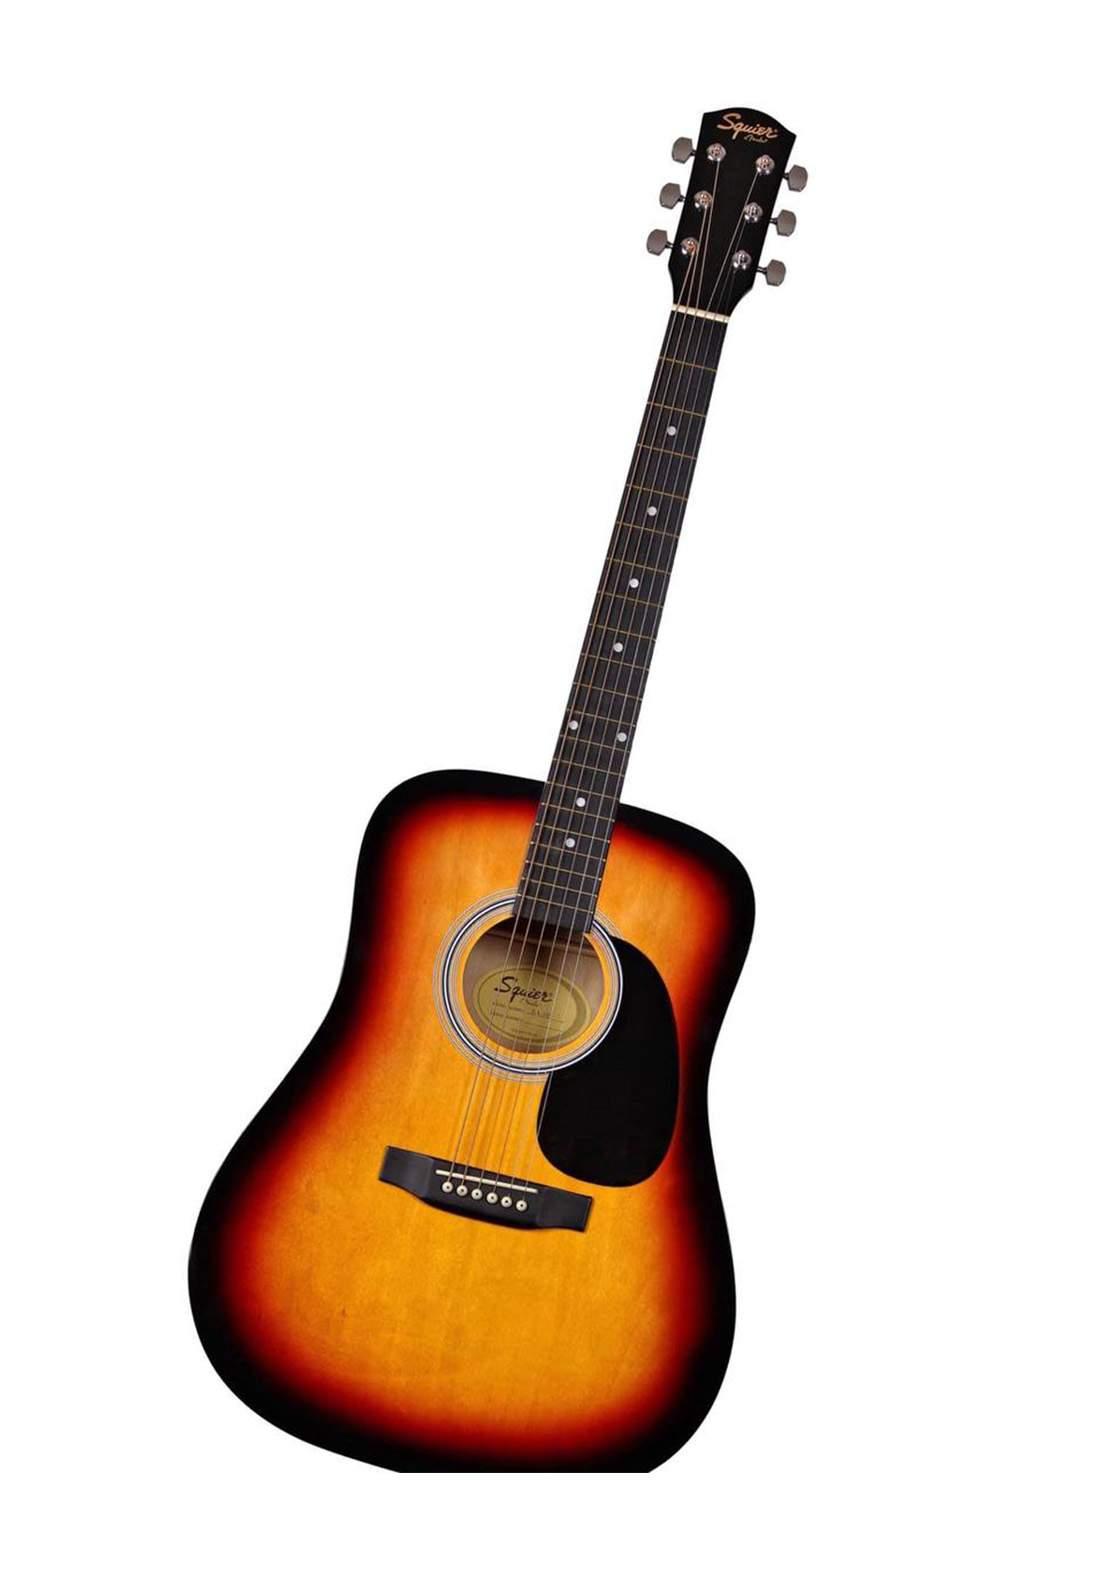 Fender Acoustic Guitar SA-150 - اكوستك جيتار